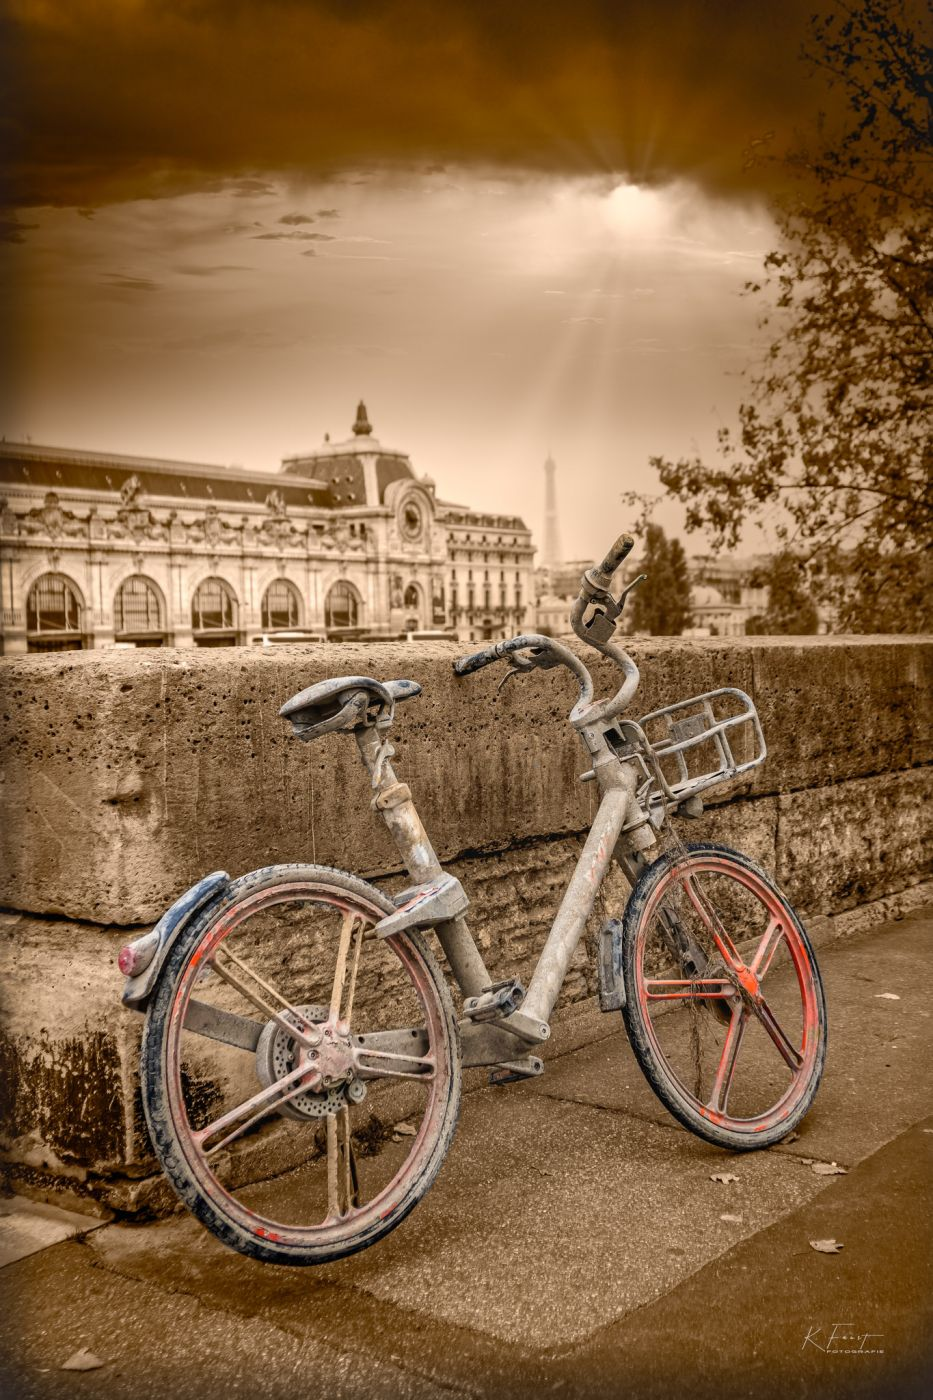 Paris; Pont royal, France